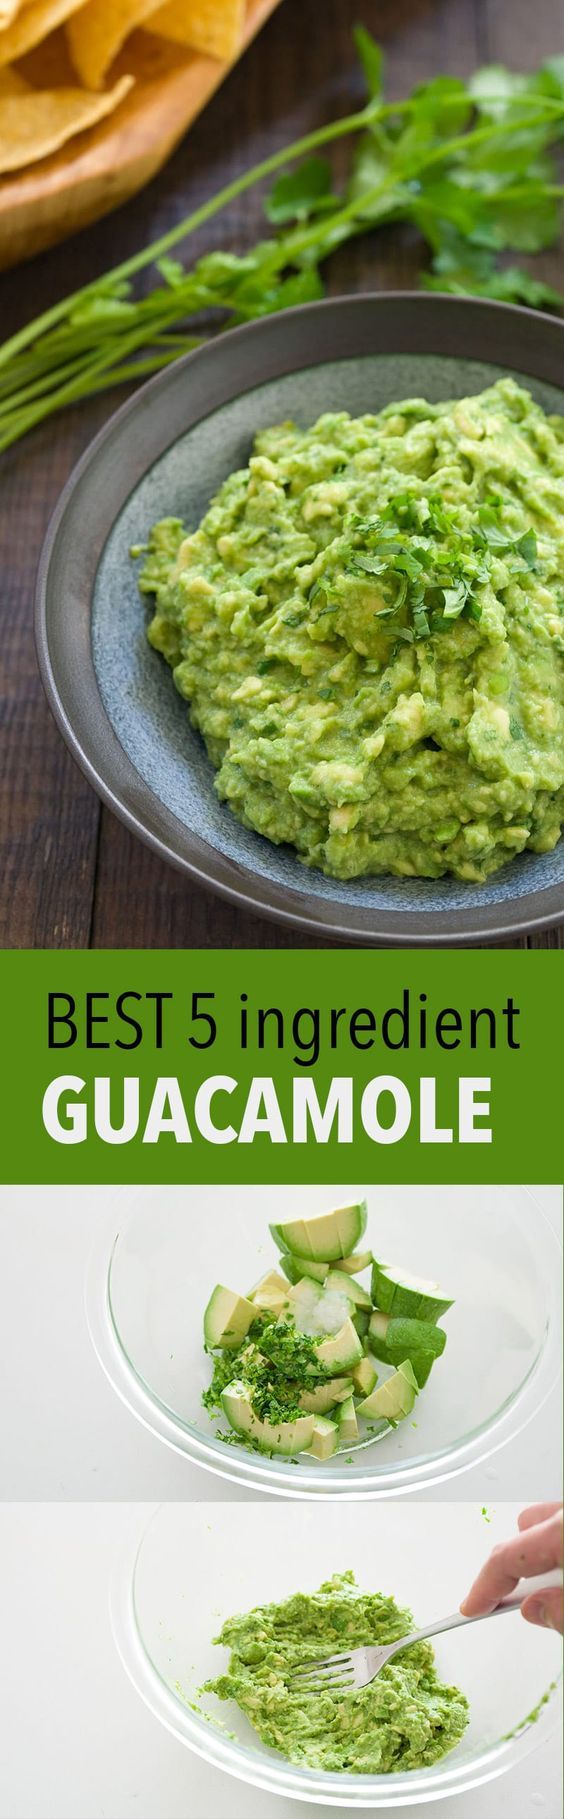 guacamole guacamole guacamole guacamole guacamole the best basic